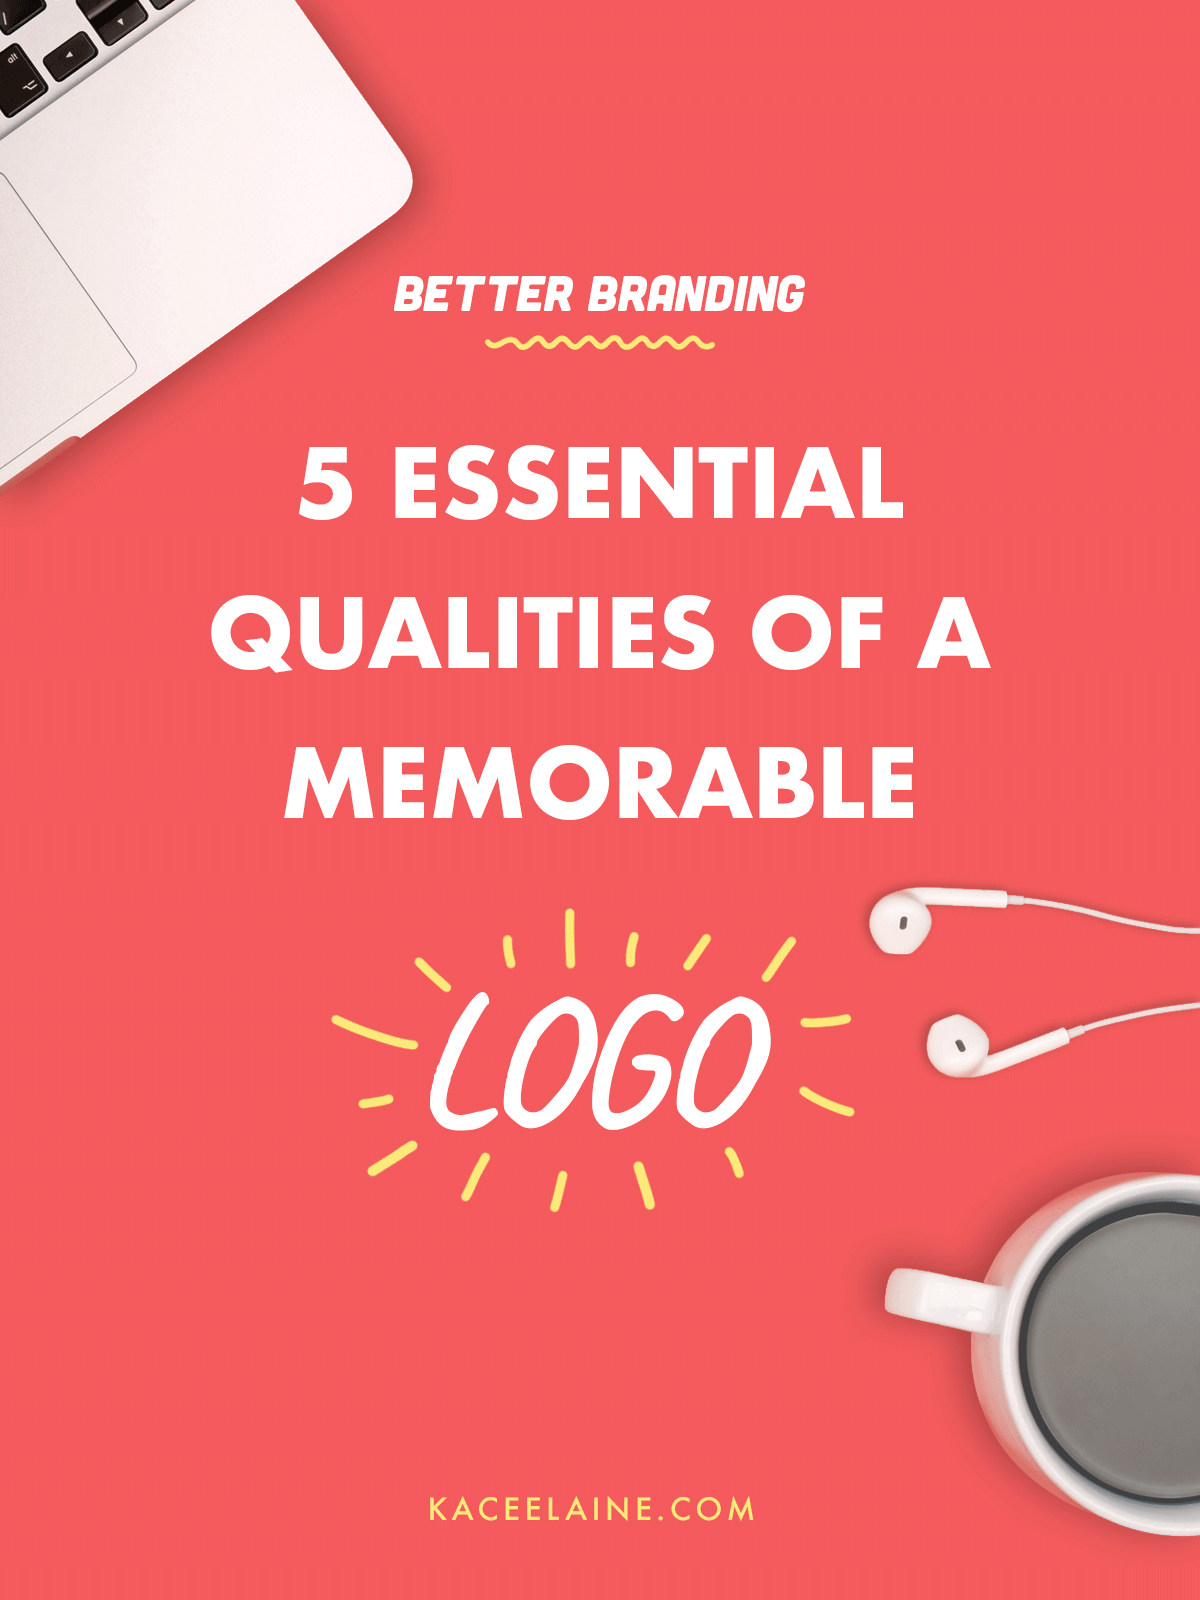 5 Essential Qualities of a Memorable Logo